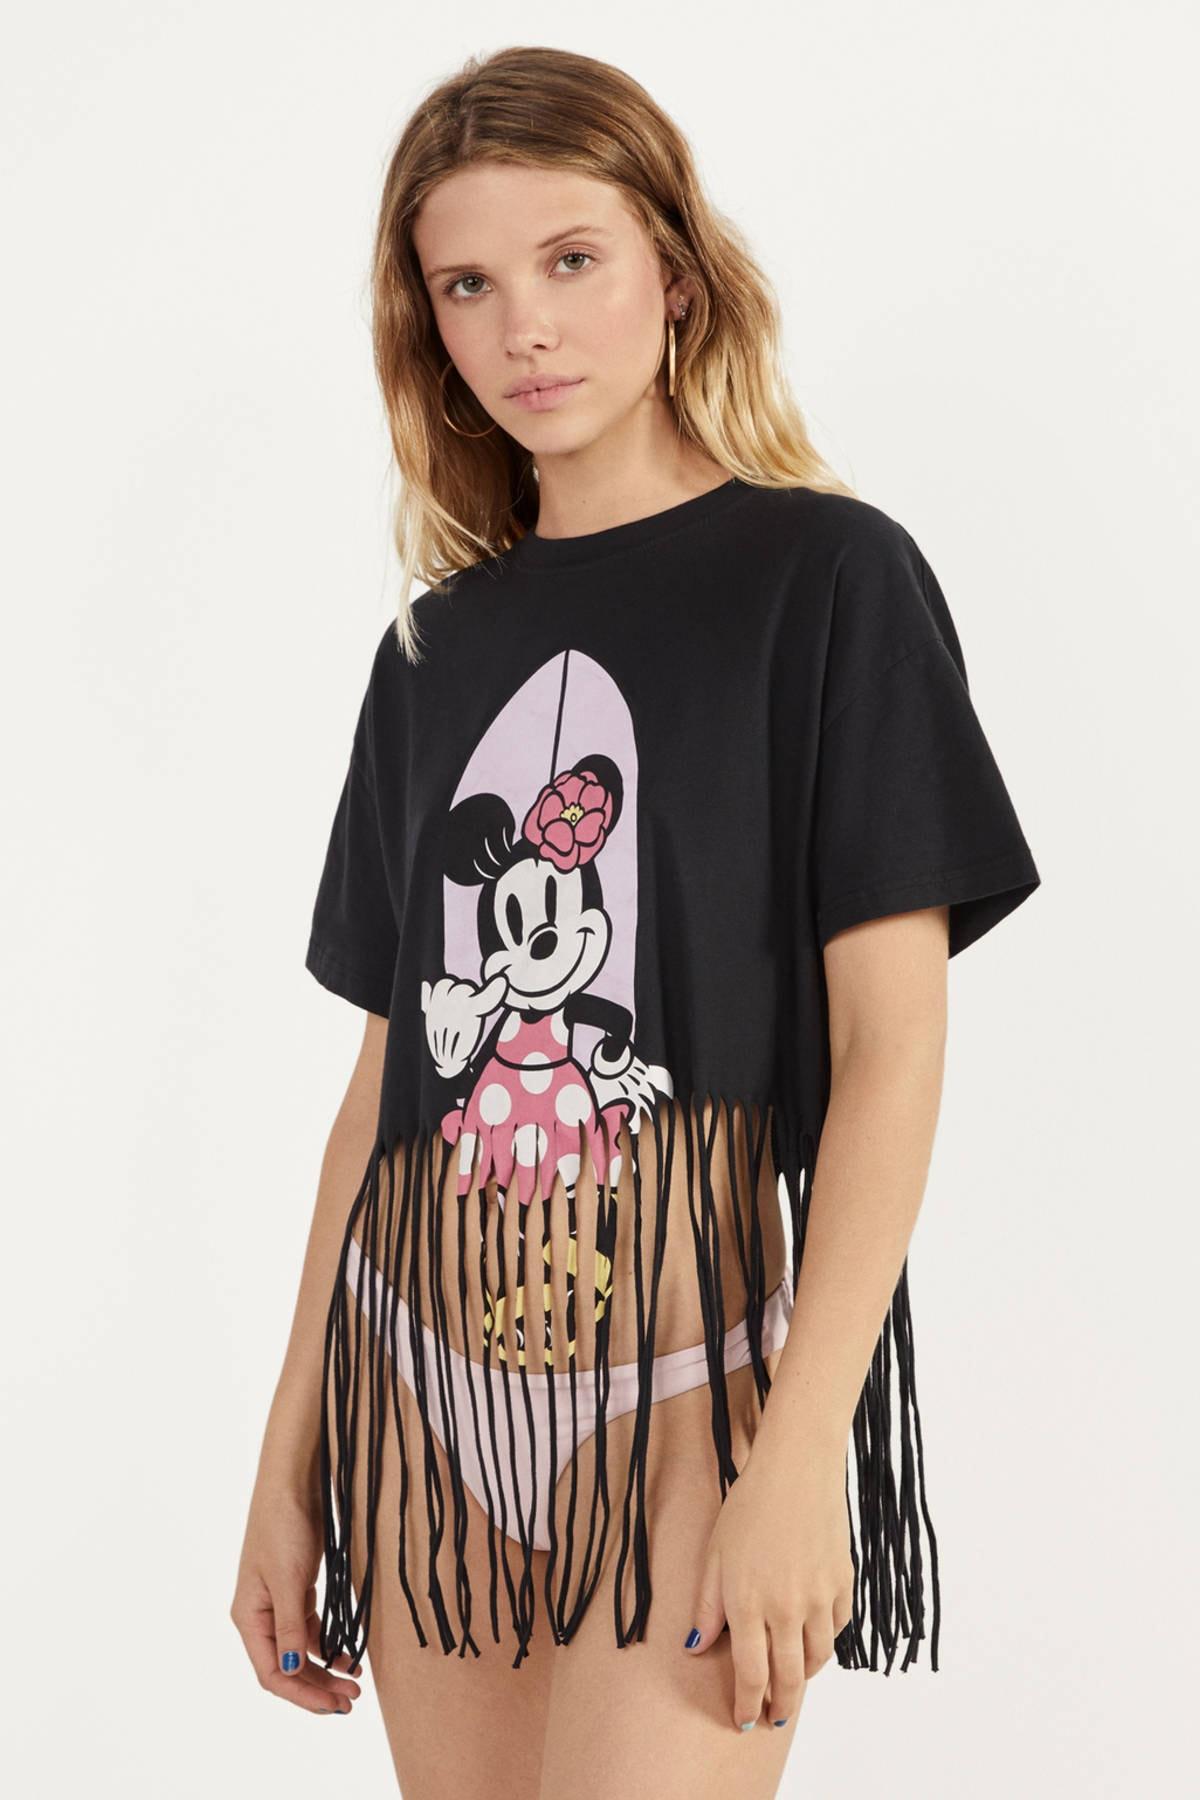 Bershka Kadın Siyah Püsküllü Minnie Baskılı T-Shirt 02246167